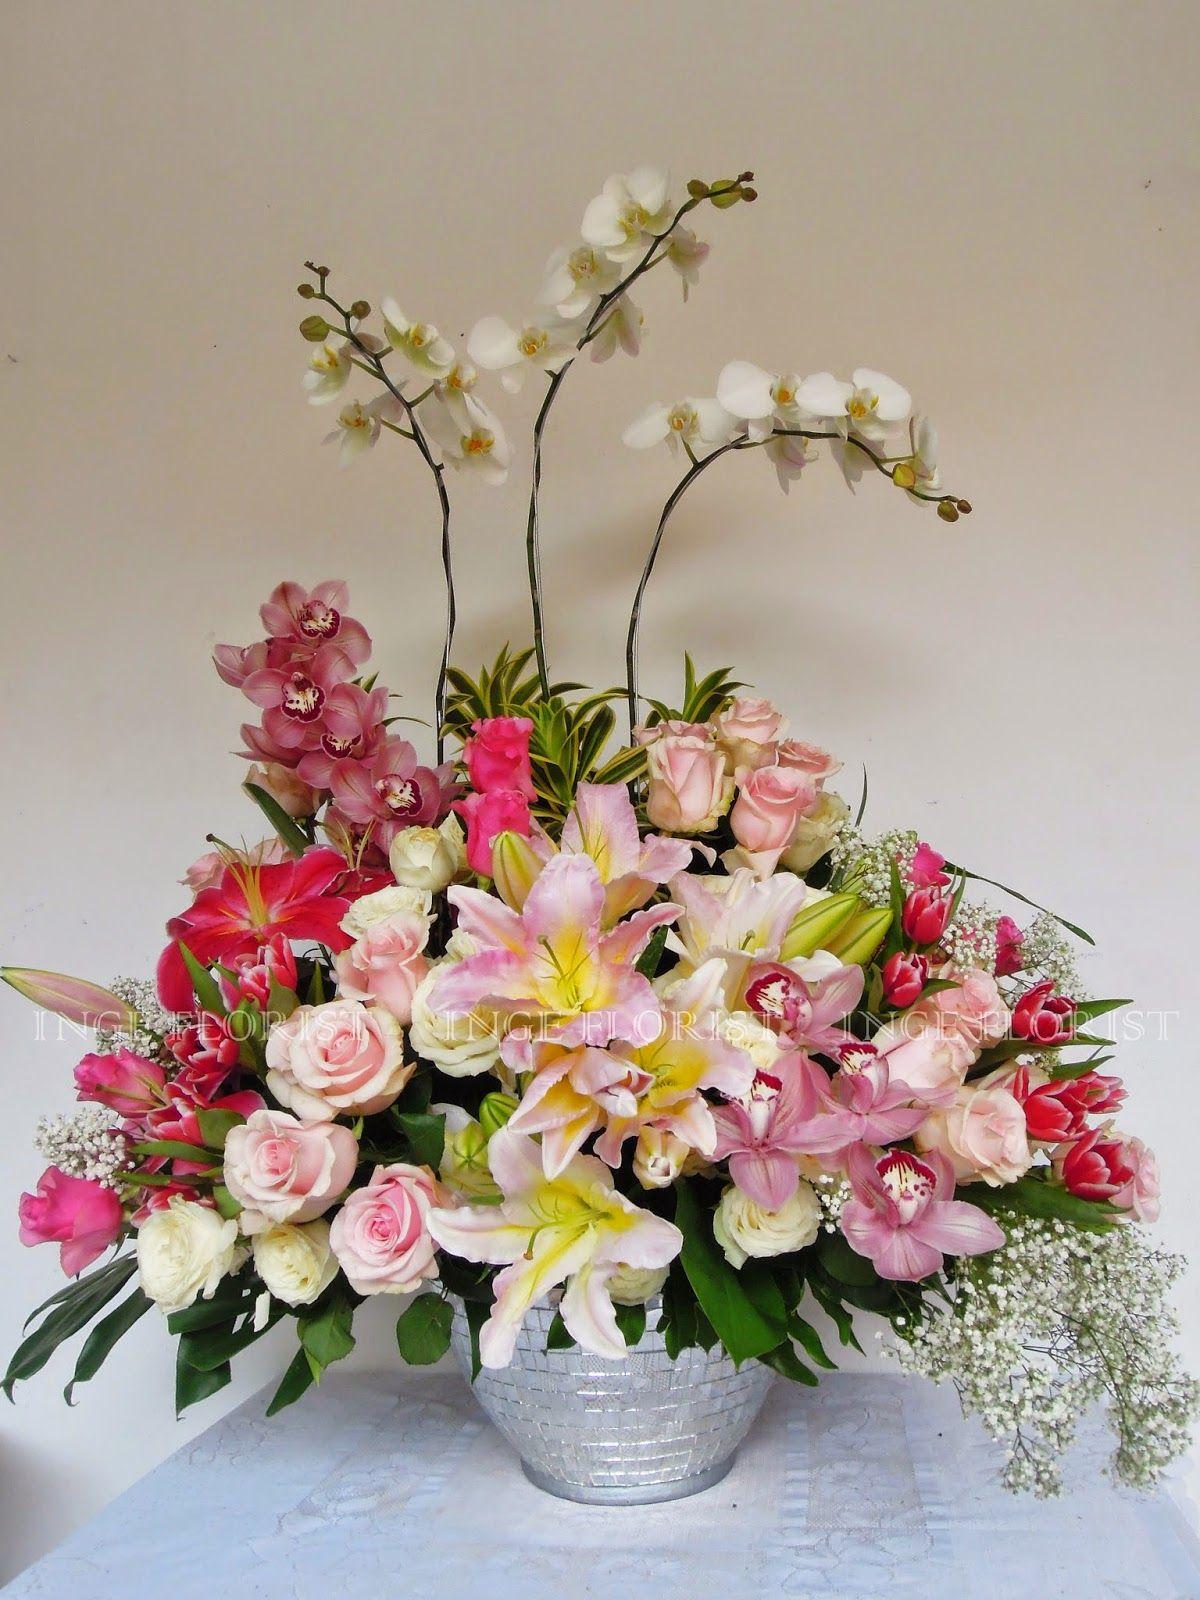 Florist Kencana Toko Bunga Bandung Murah menyediakan